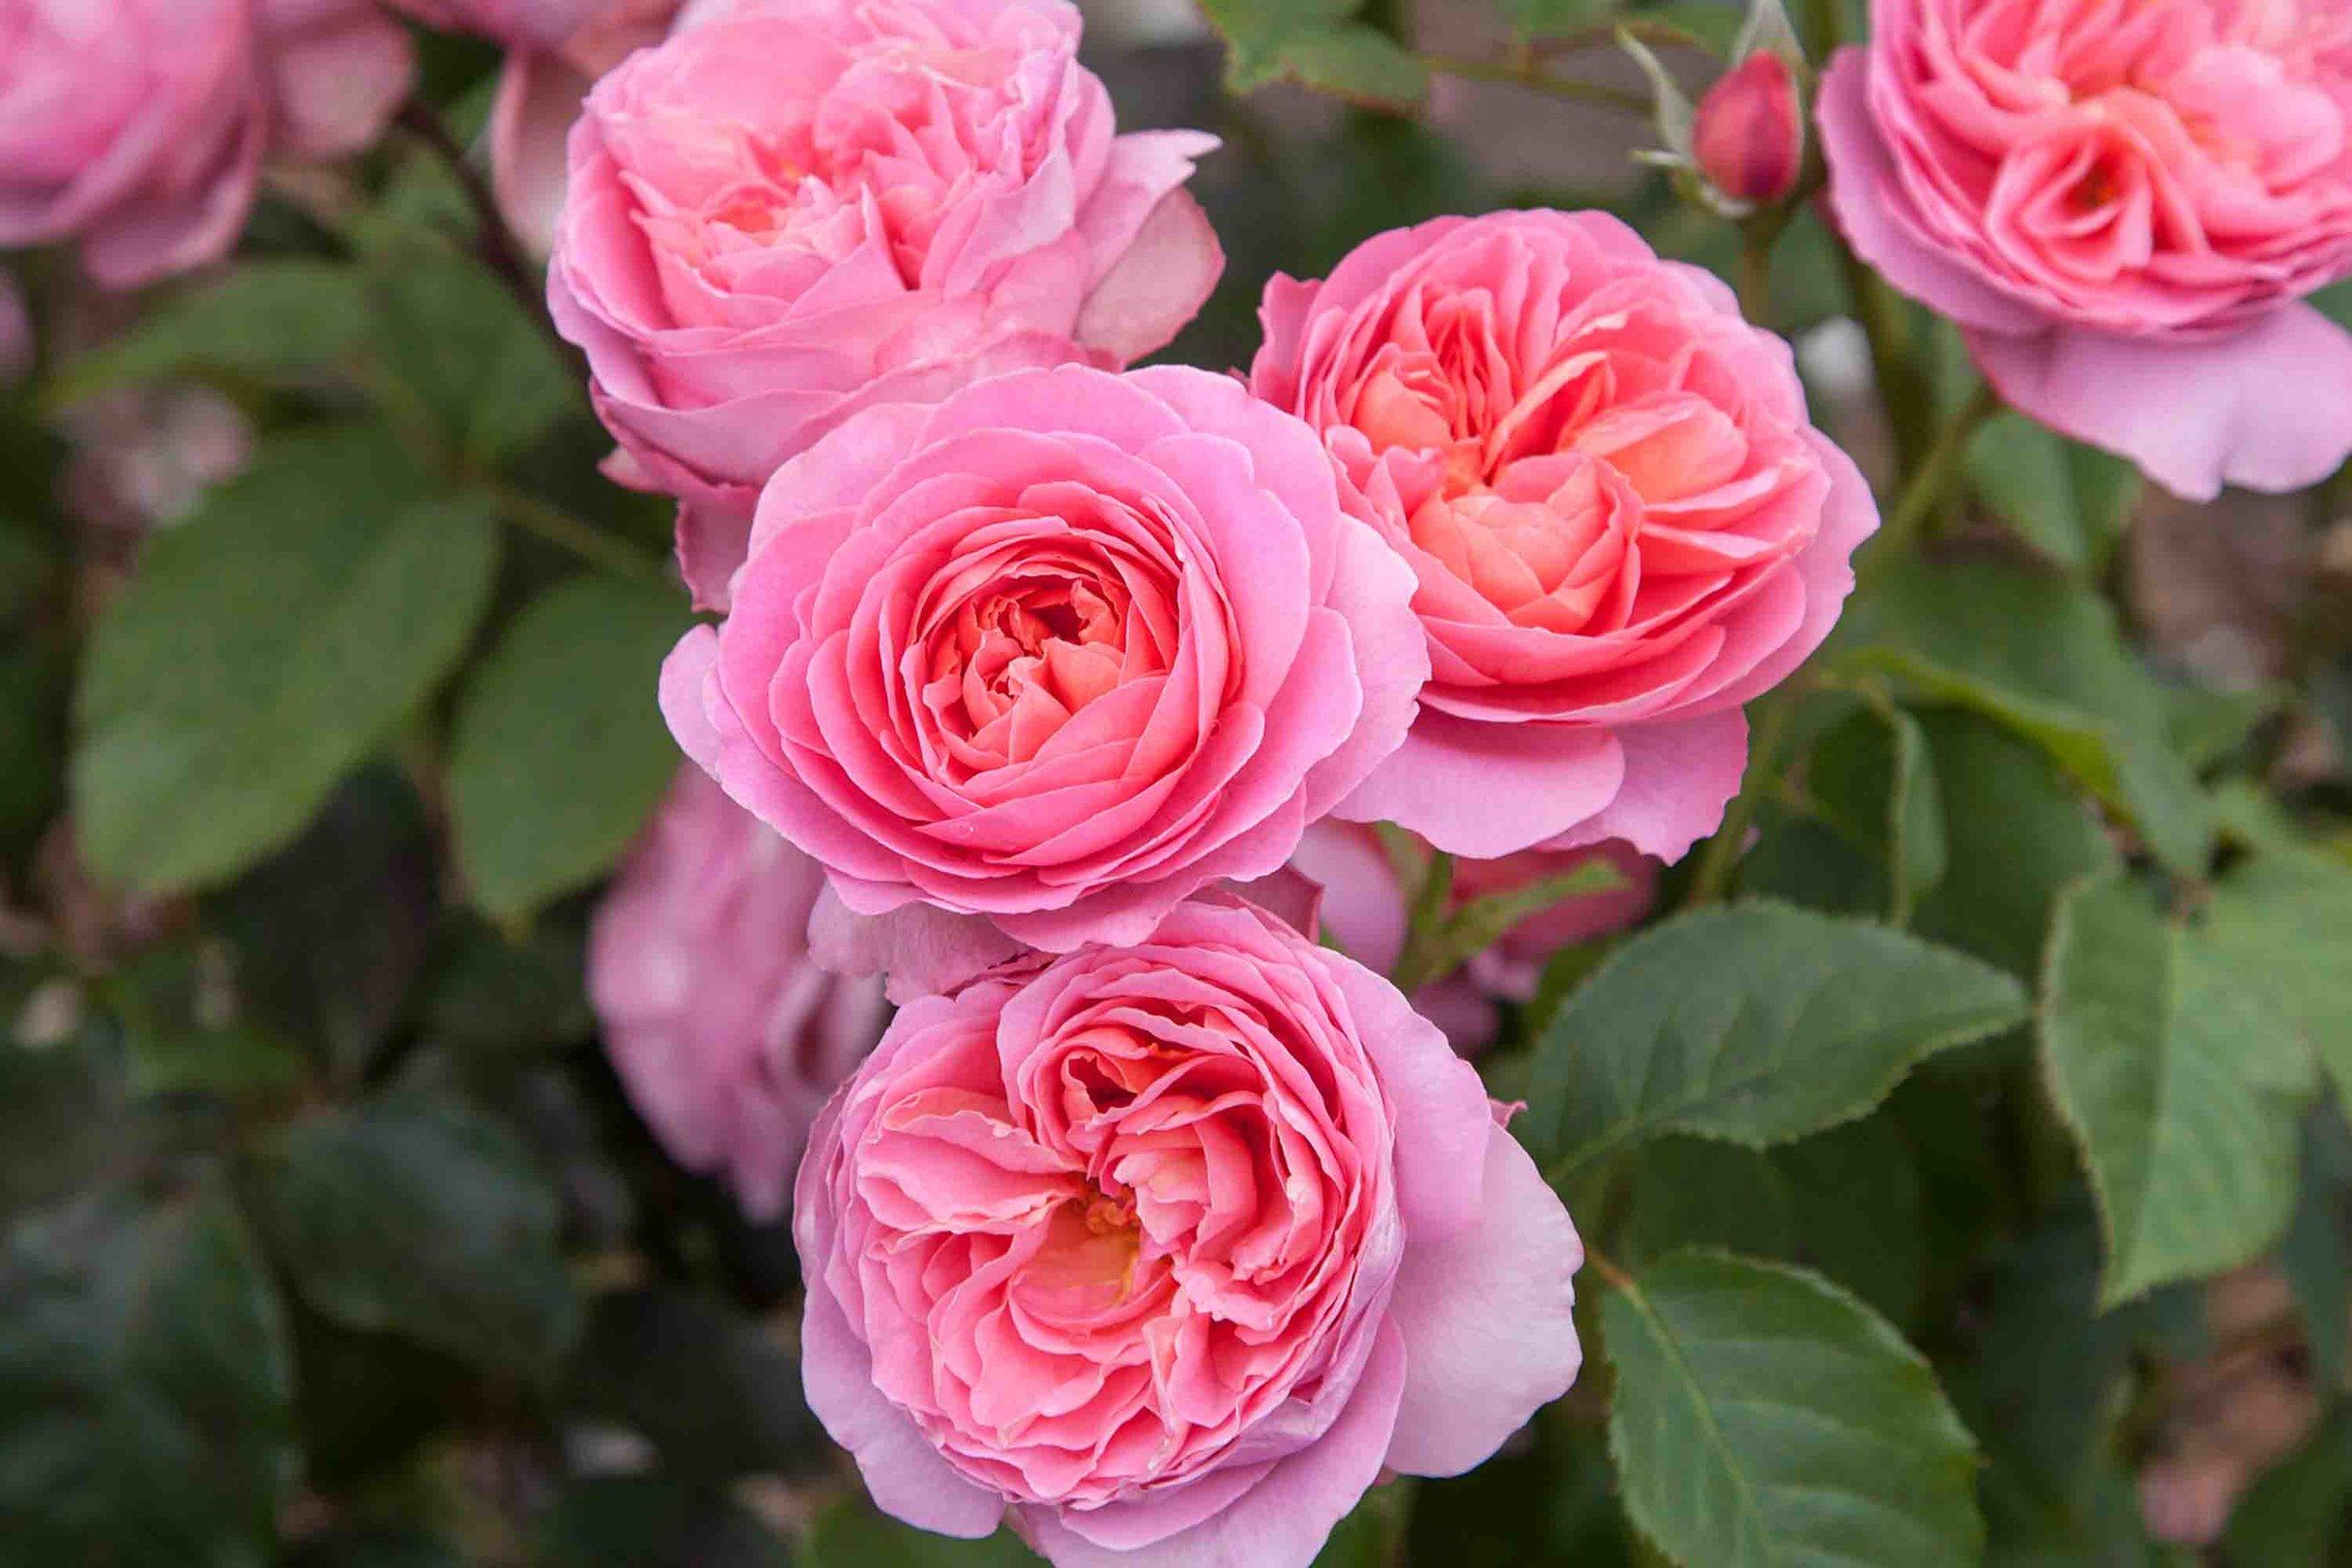 roses-reduced-10.jpg